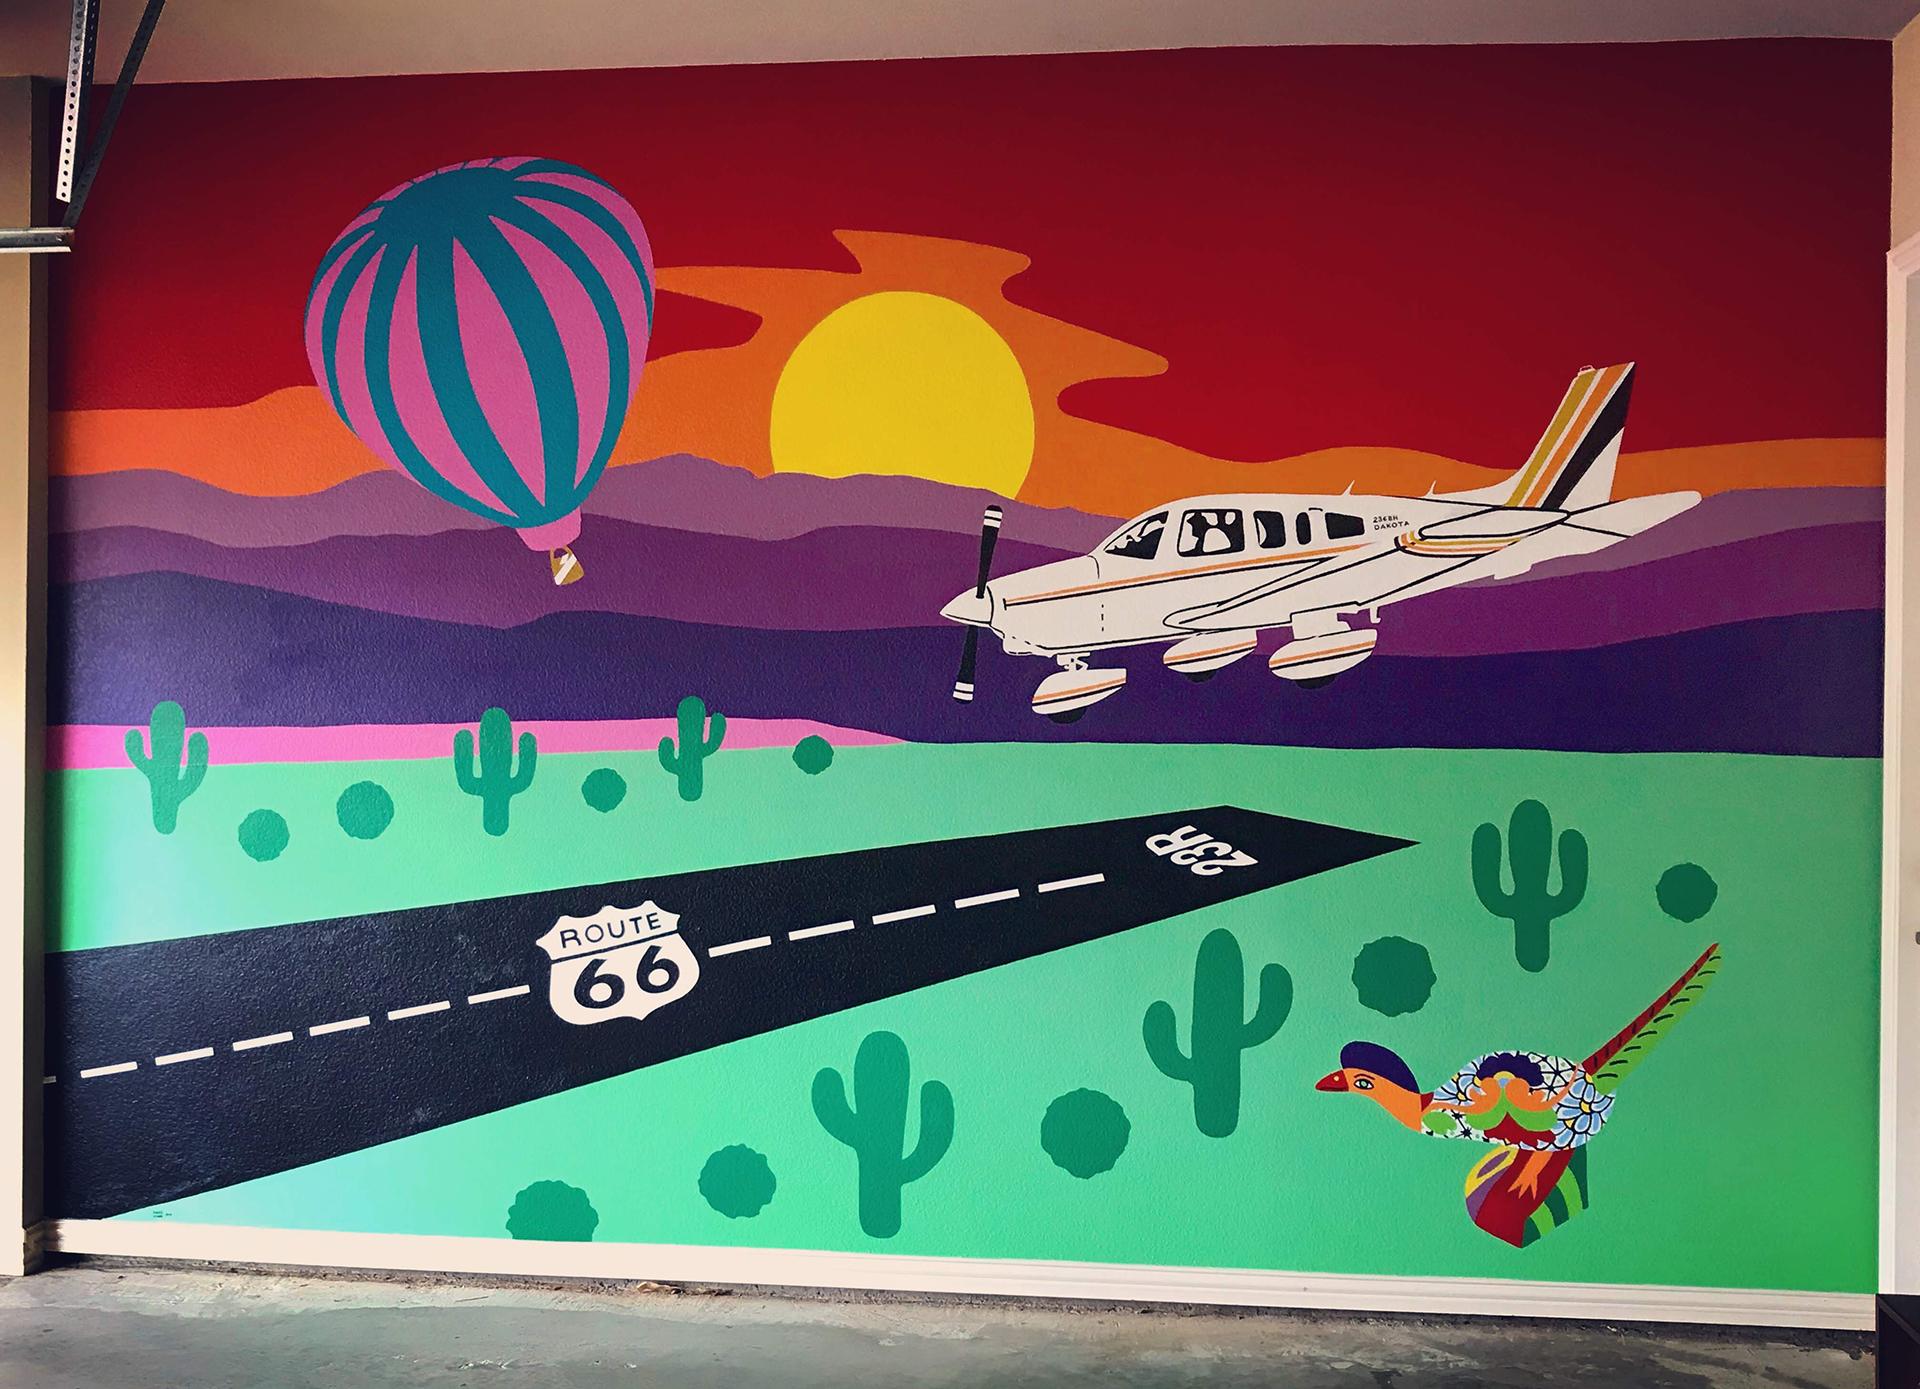 New Mexico mural - flying mural - plane mural - hot air balloon mural - Dace Kidd - Mural Artist Tx